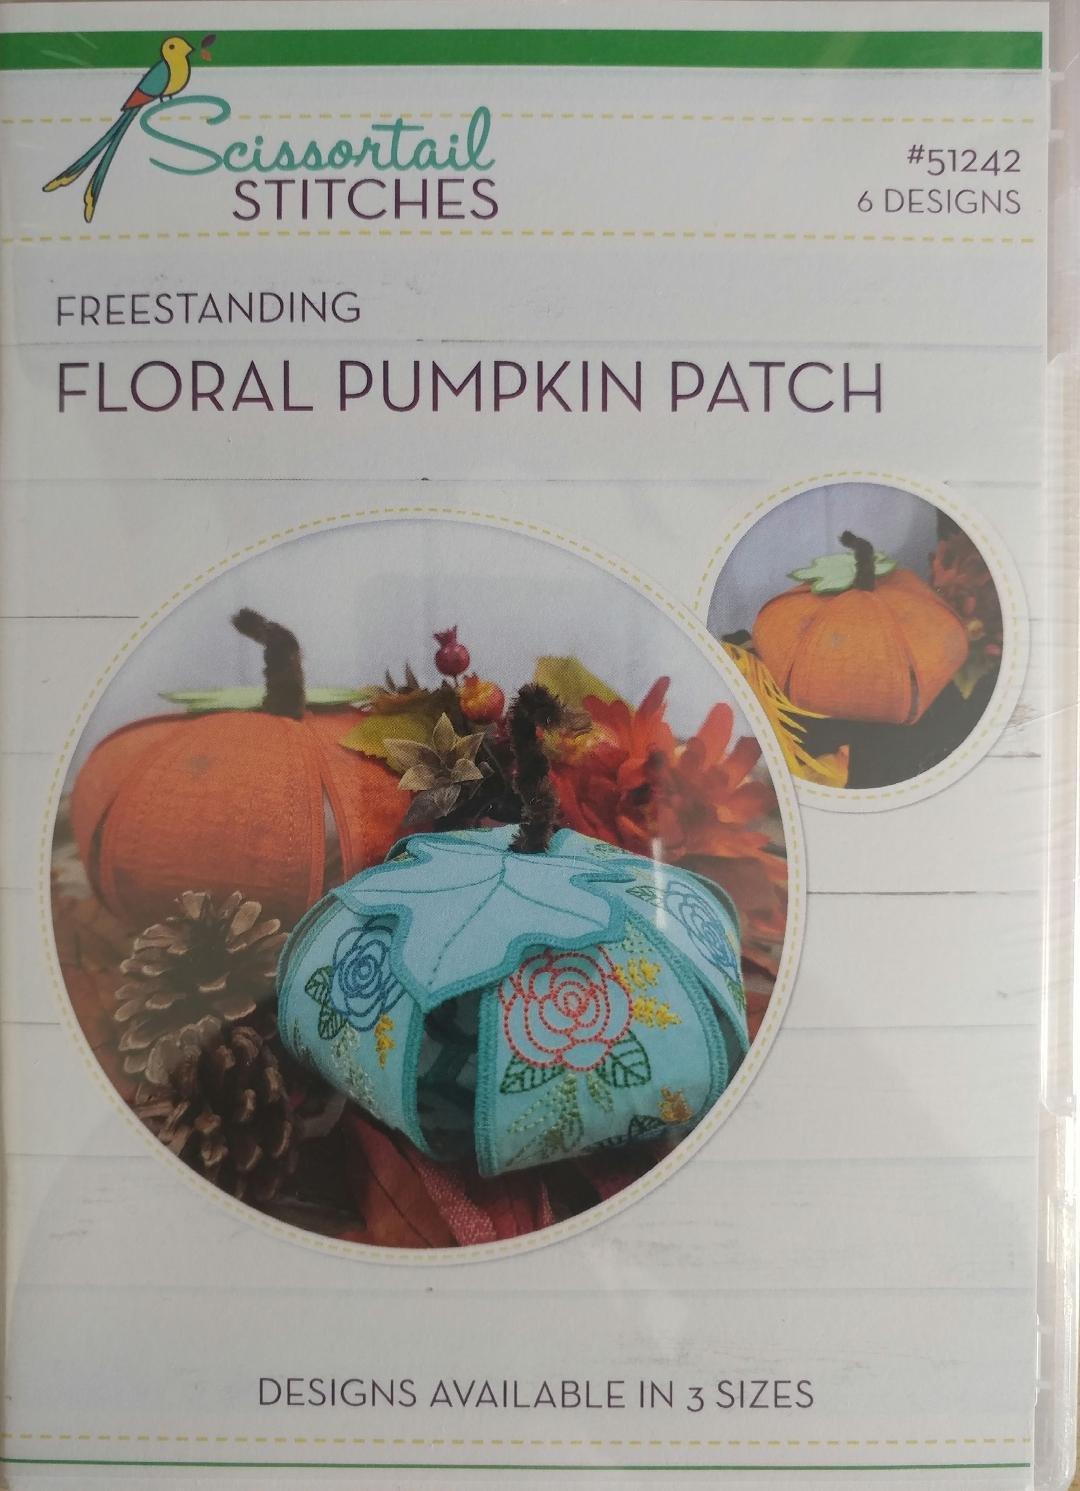 FS Floral Pumpkin Patch